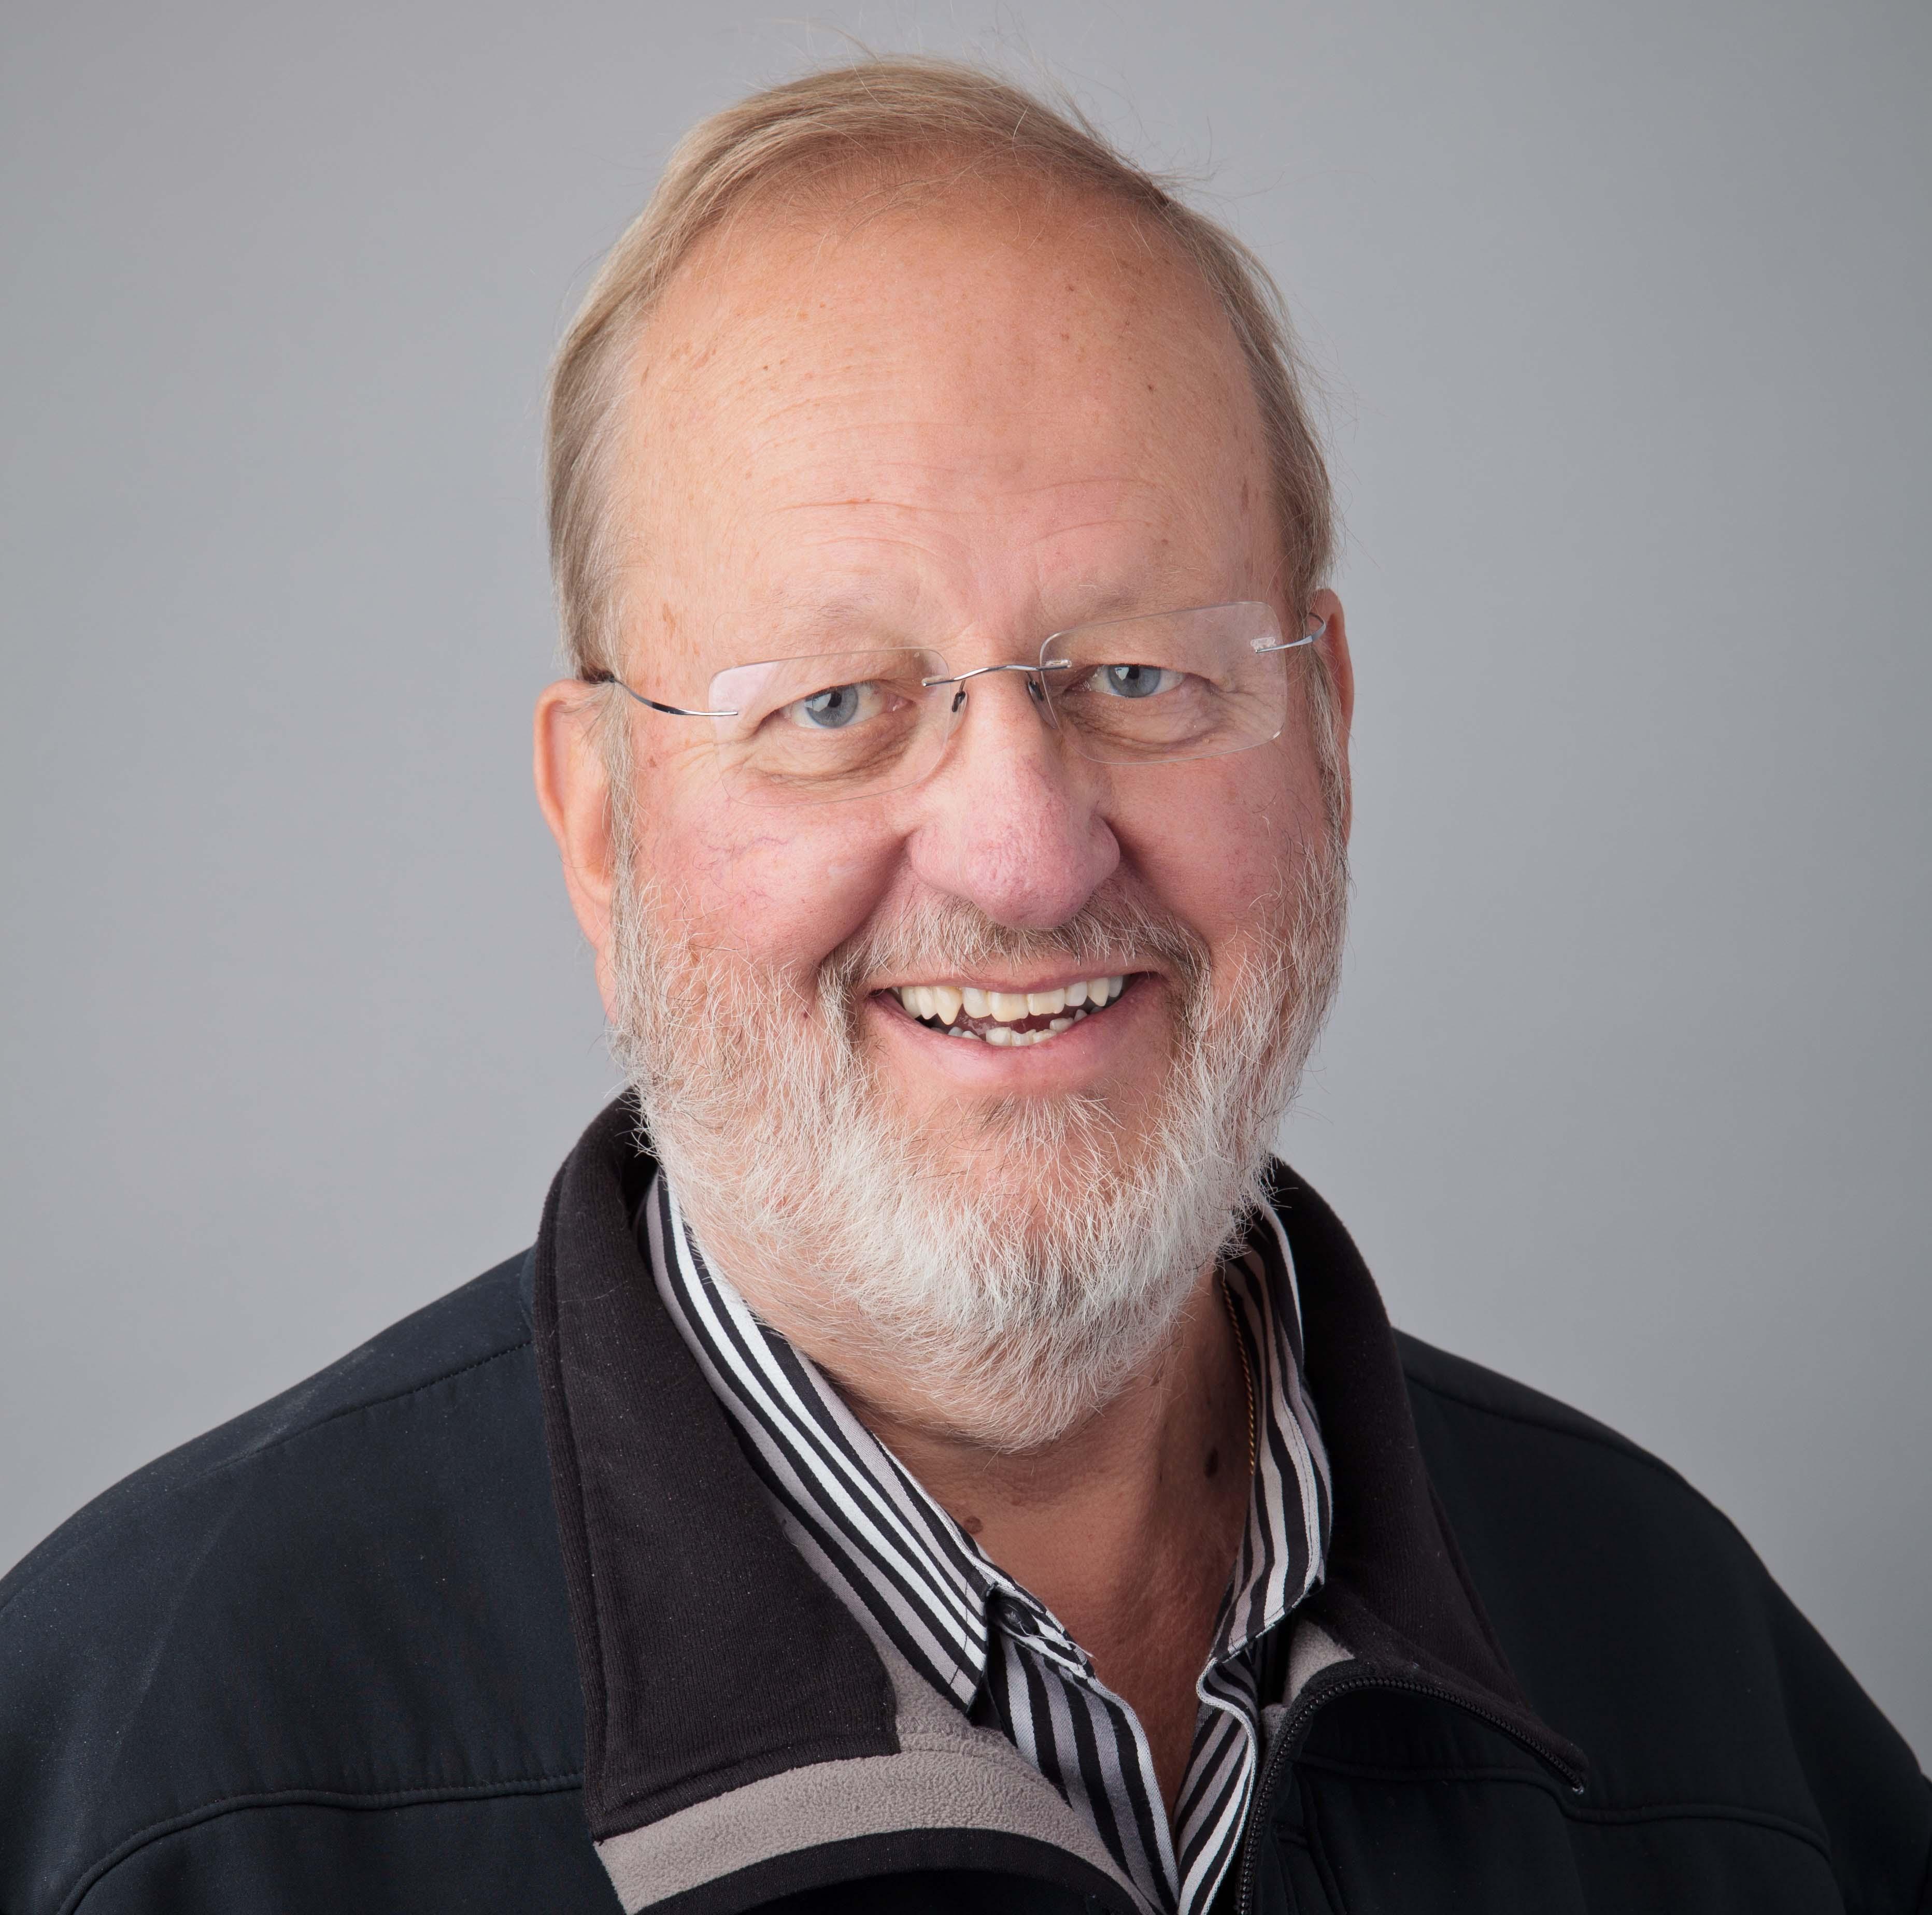 Steve Schmidt